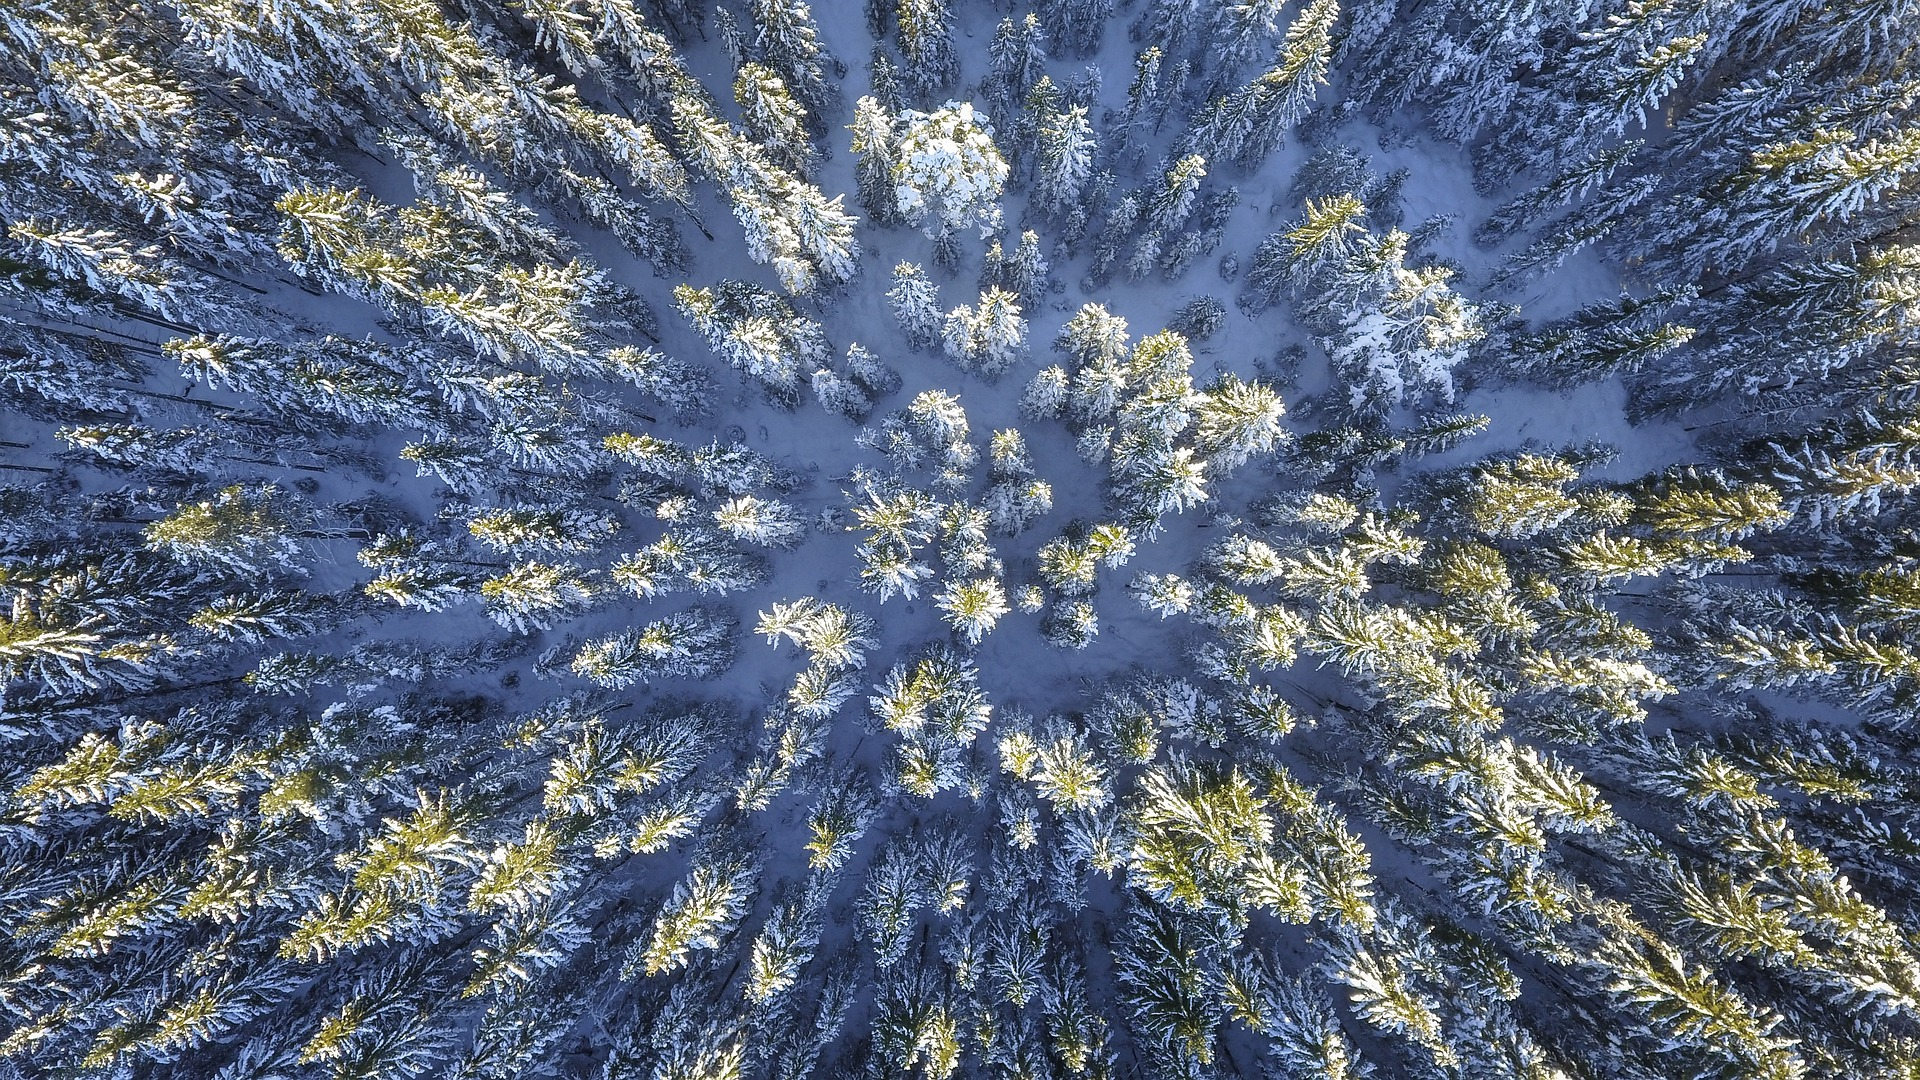 forest-2118320_1920.jpg